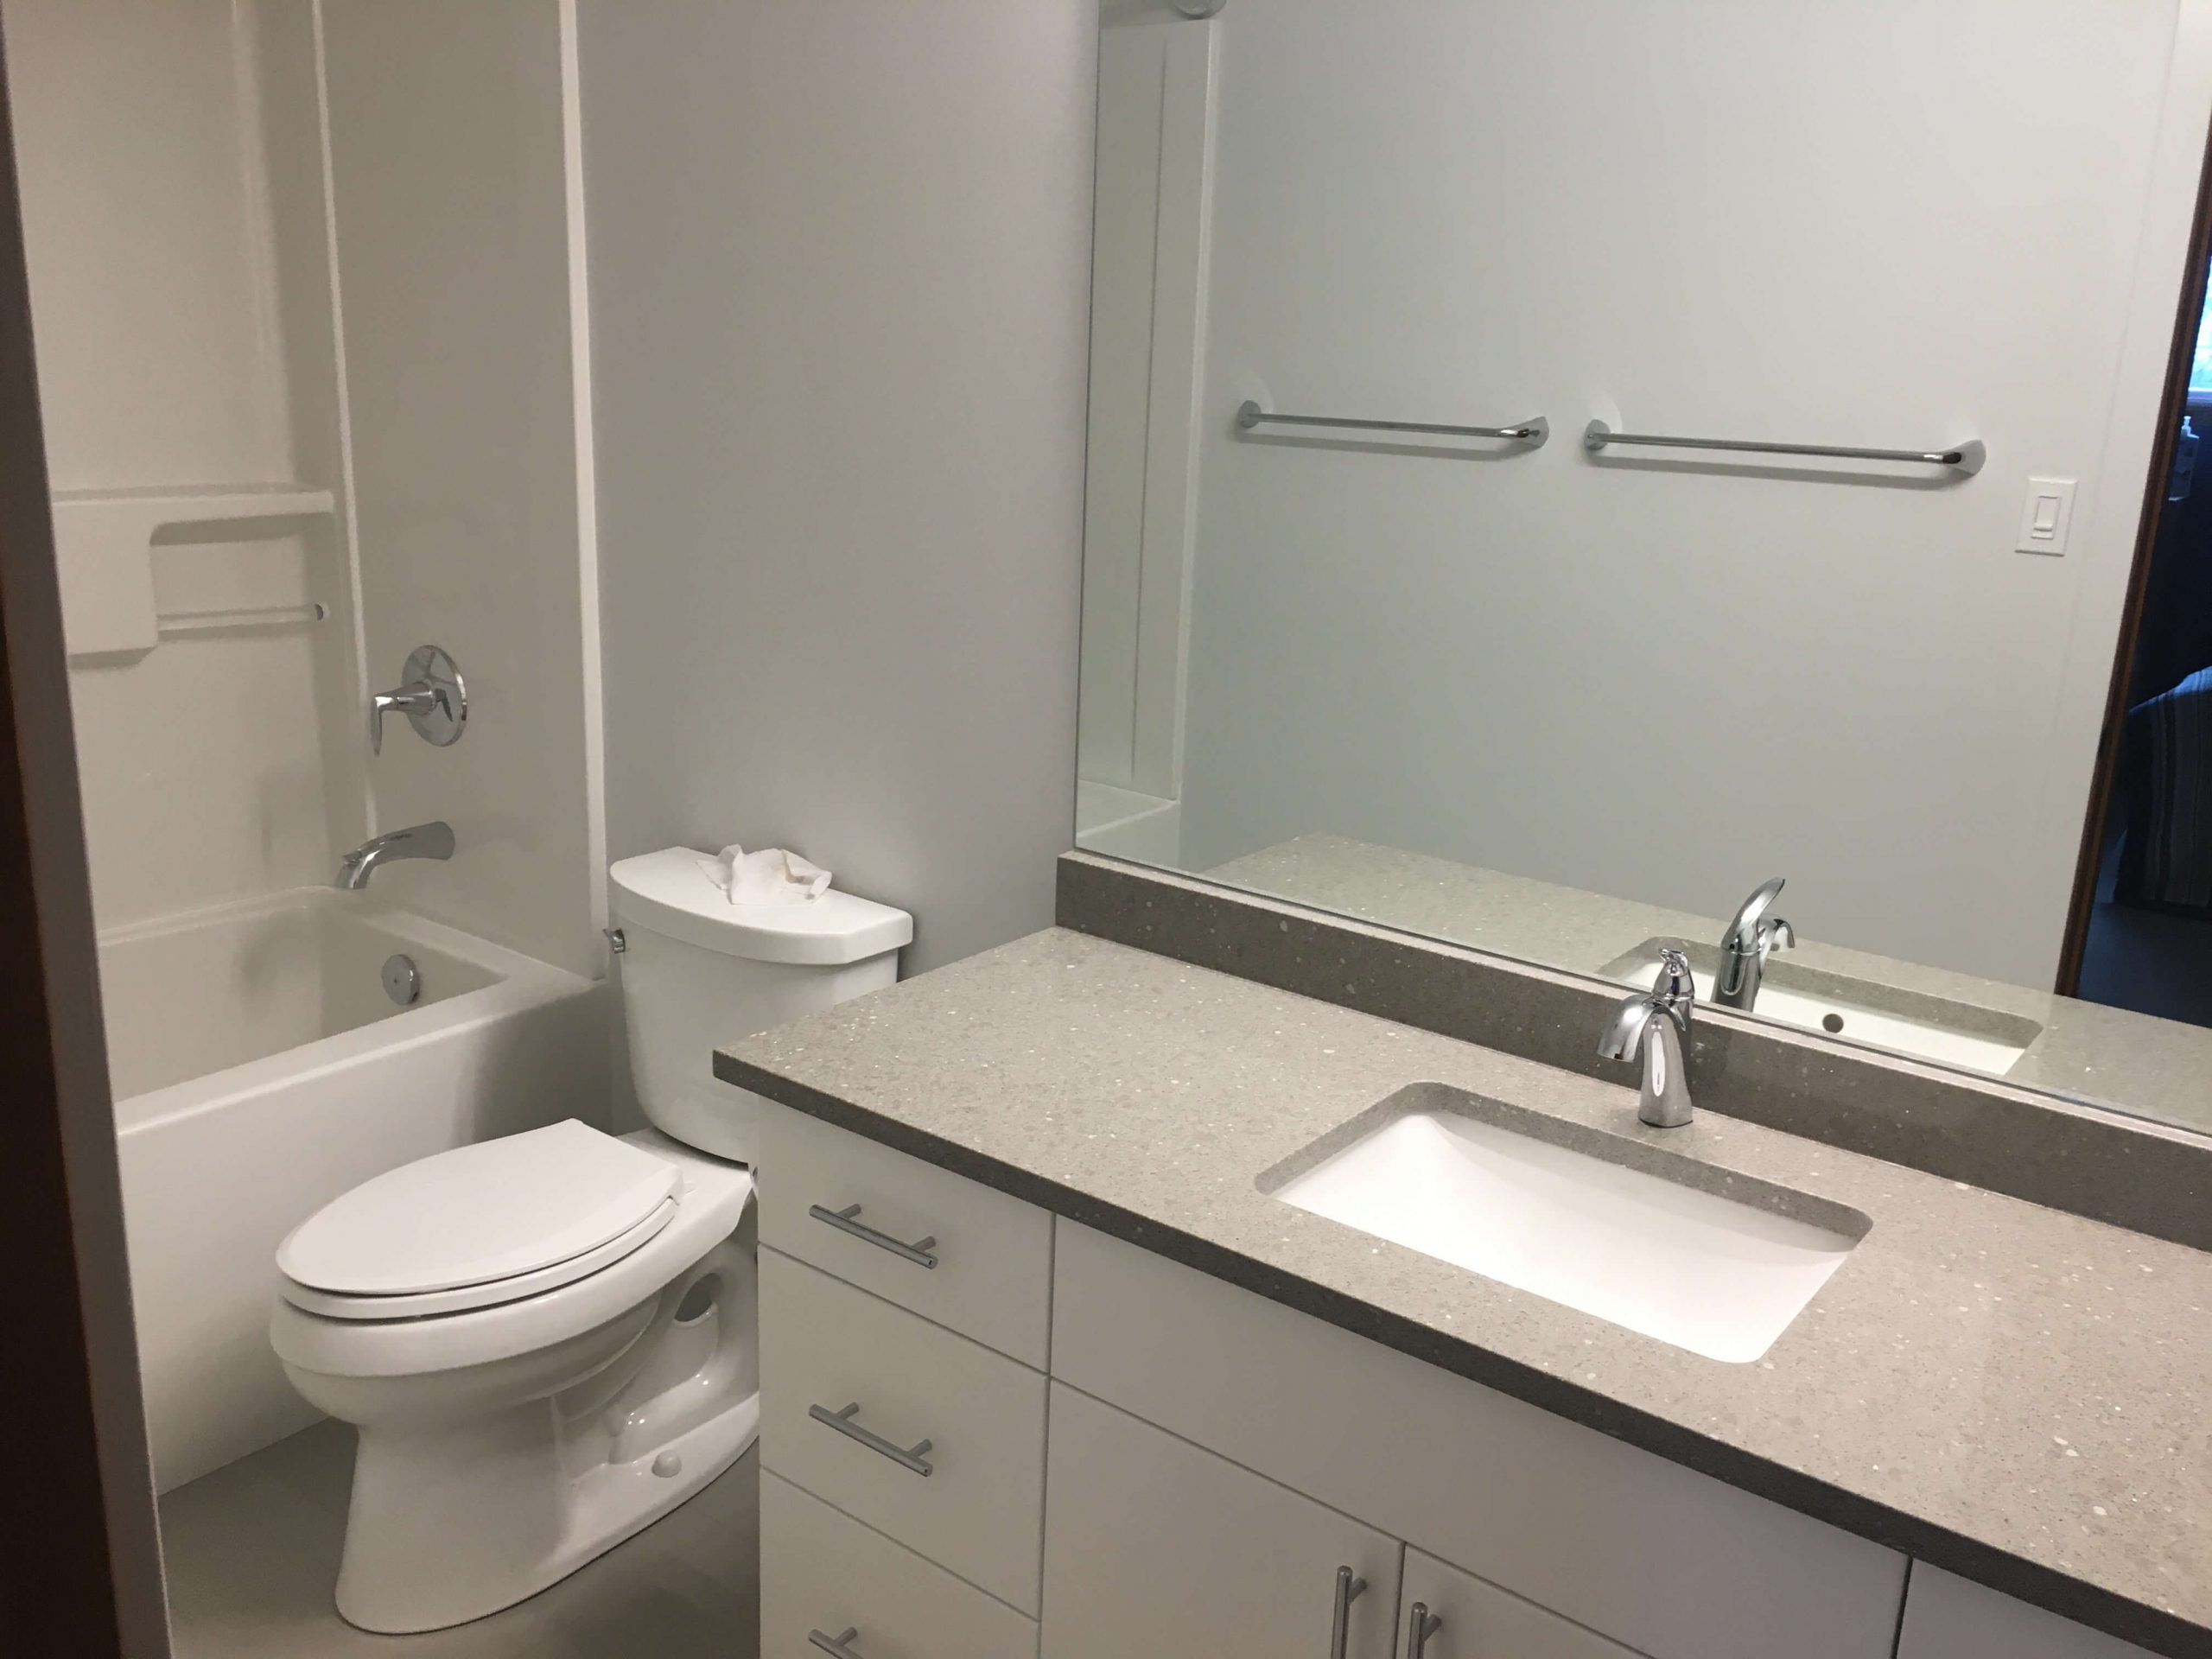 Cliffwood Bathroom Renovation - Bathroom Renovations Winnipeg - All Canadian Renovations Ltd.